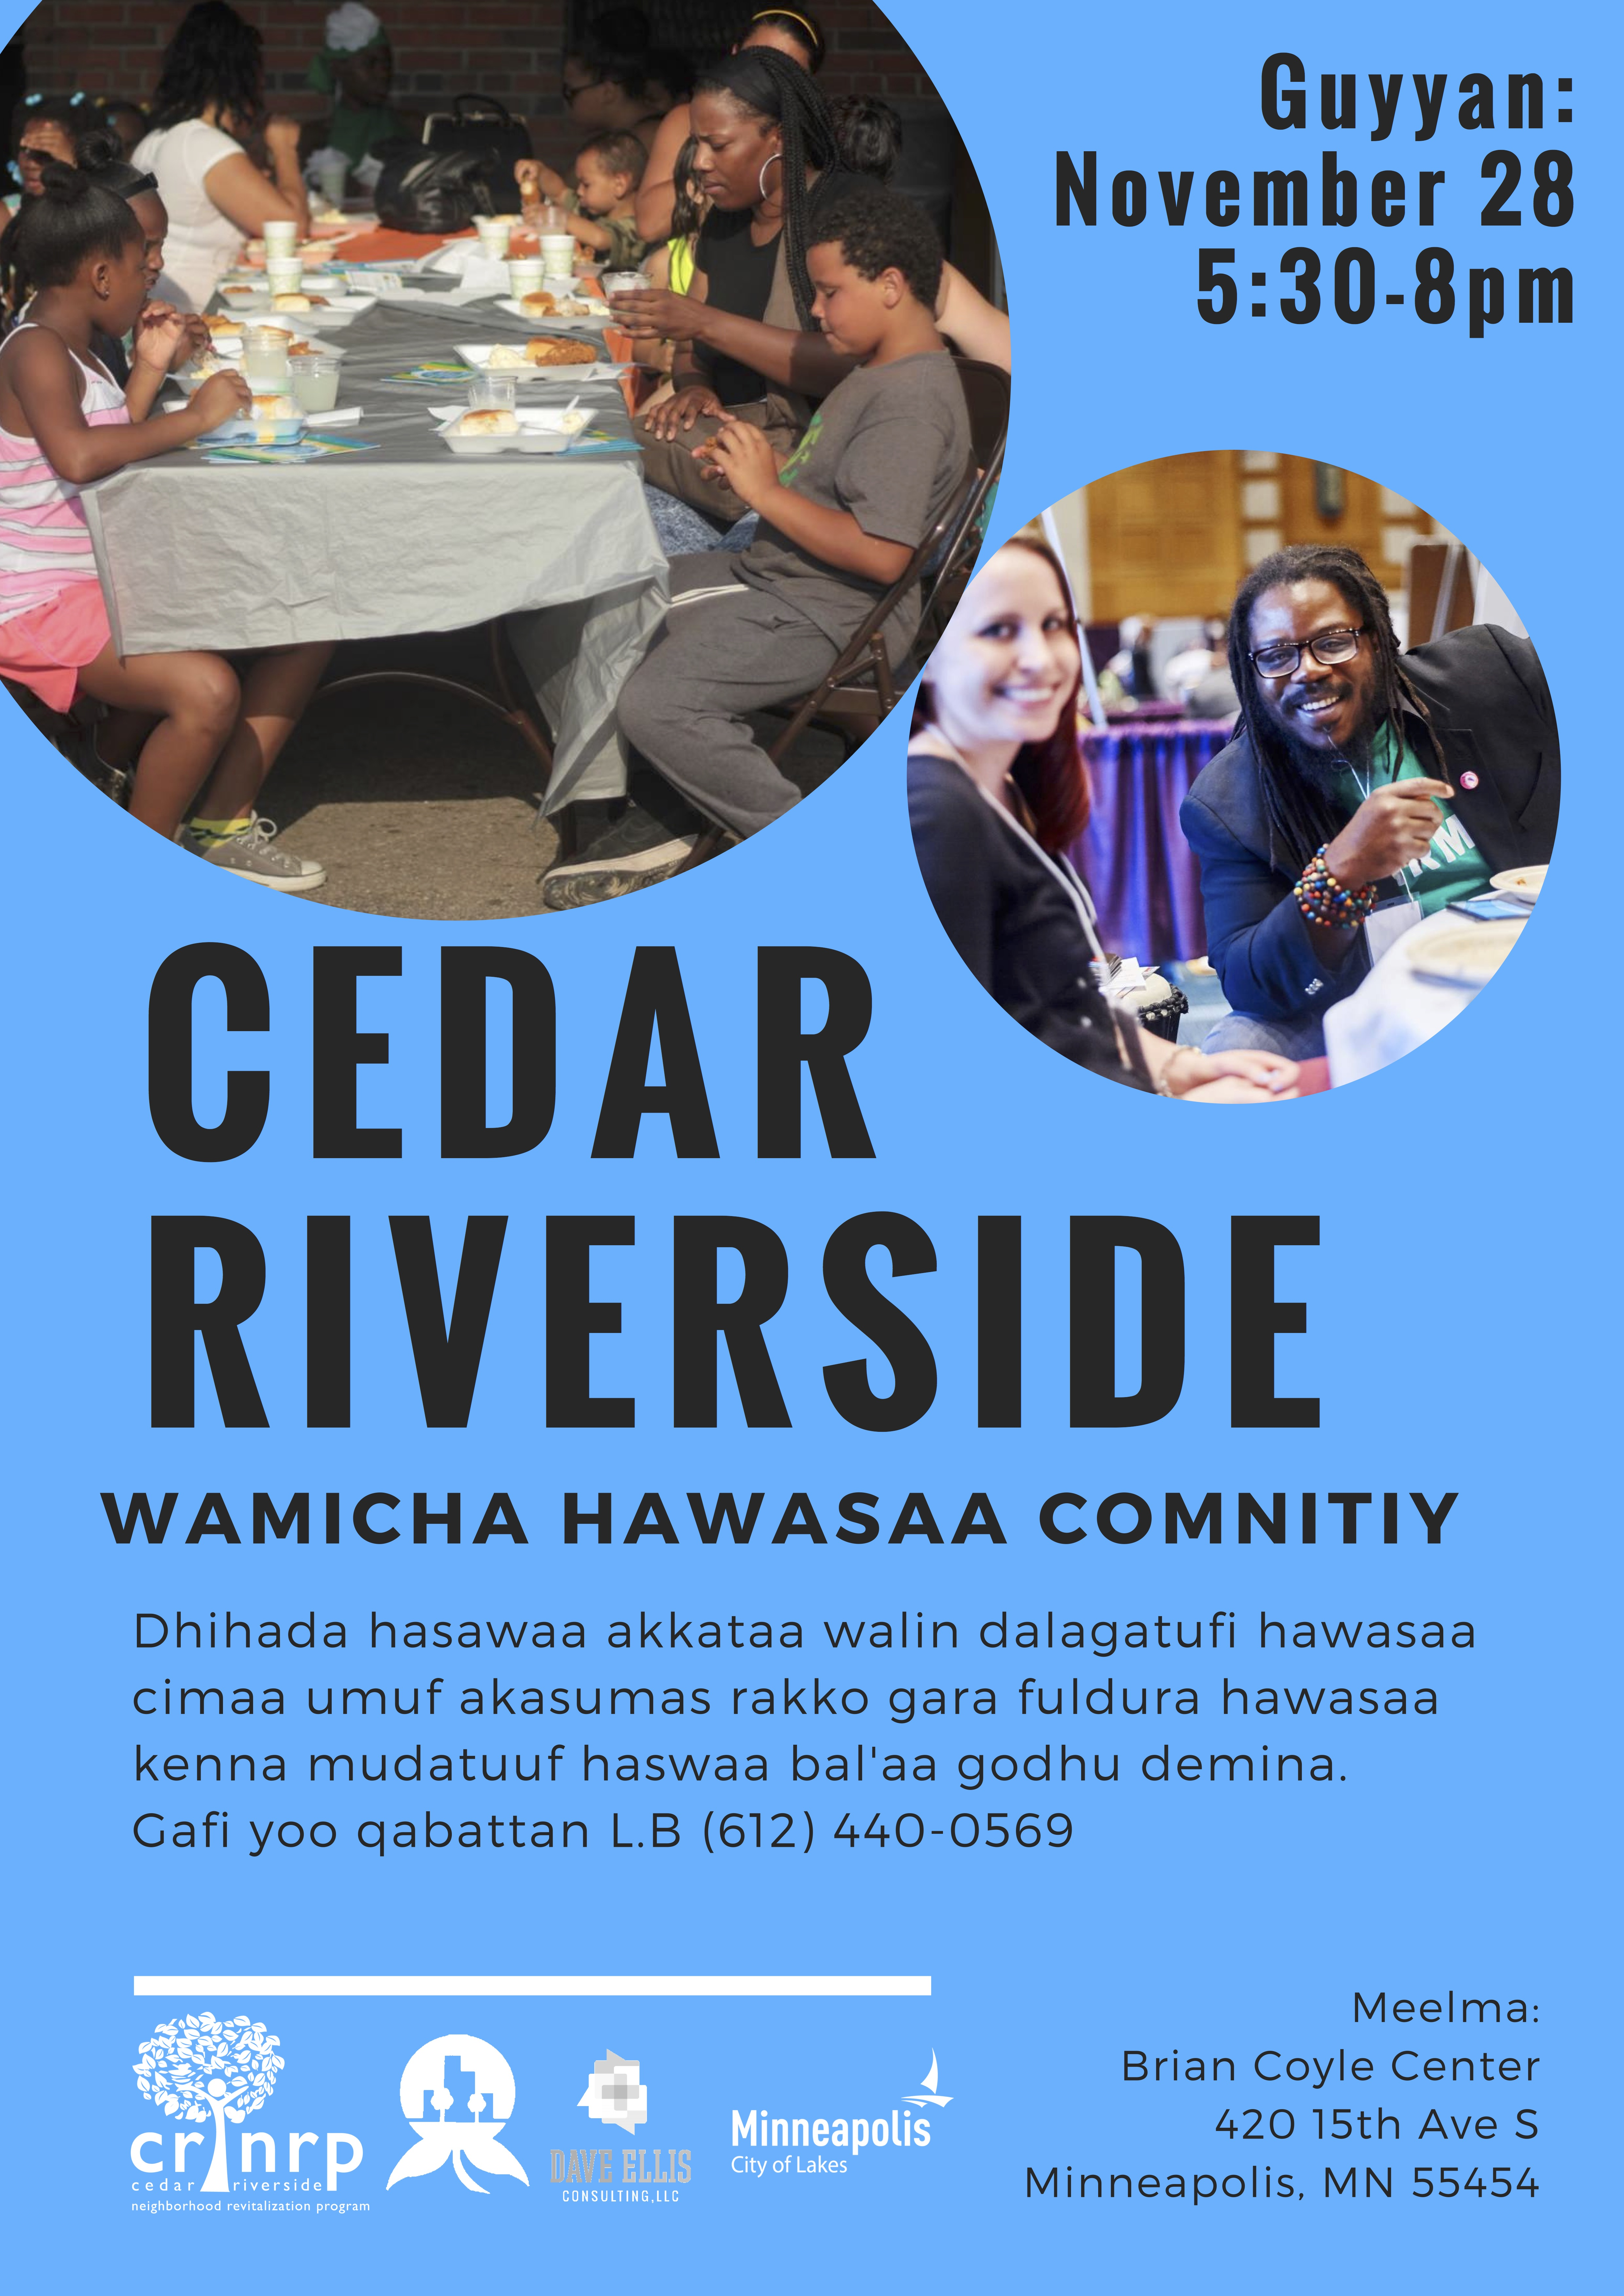 Oromo_Cedar_Riverside_Community_Gathering.jpg